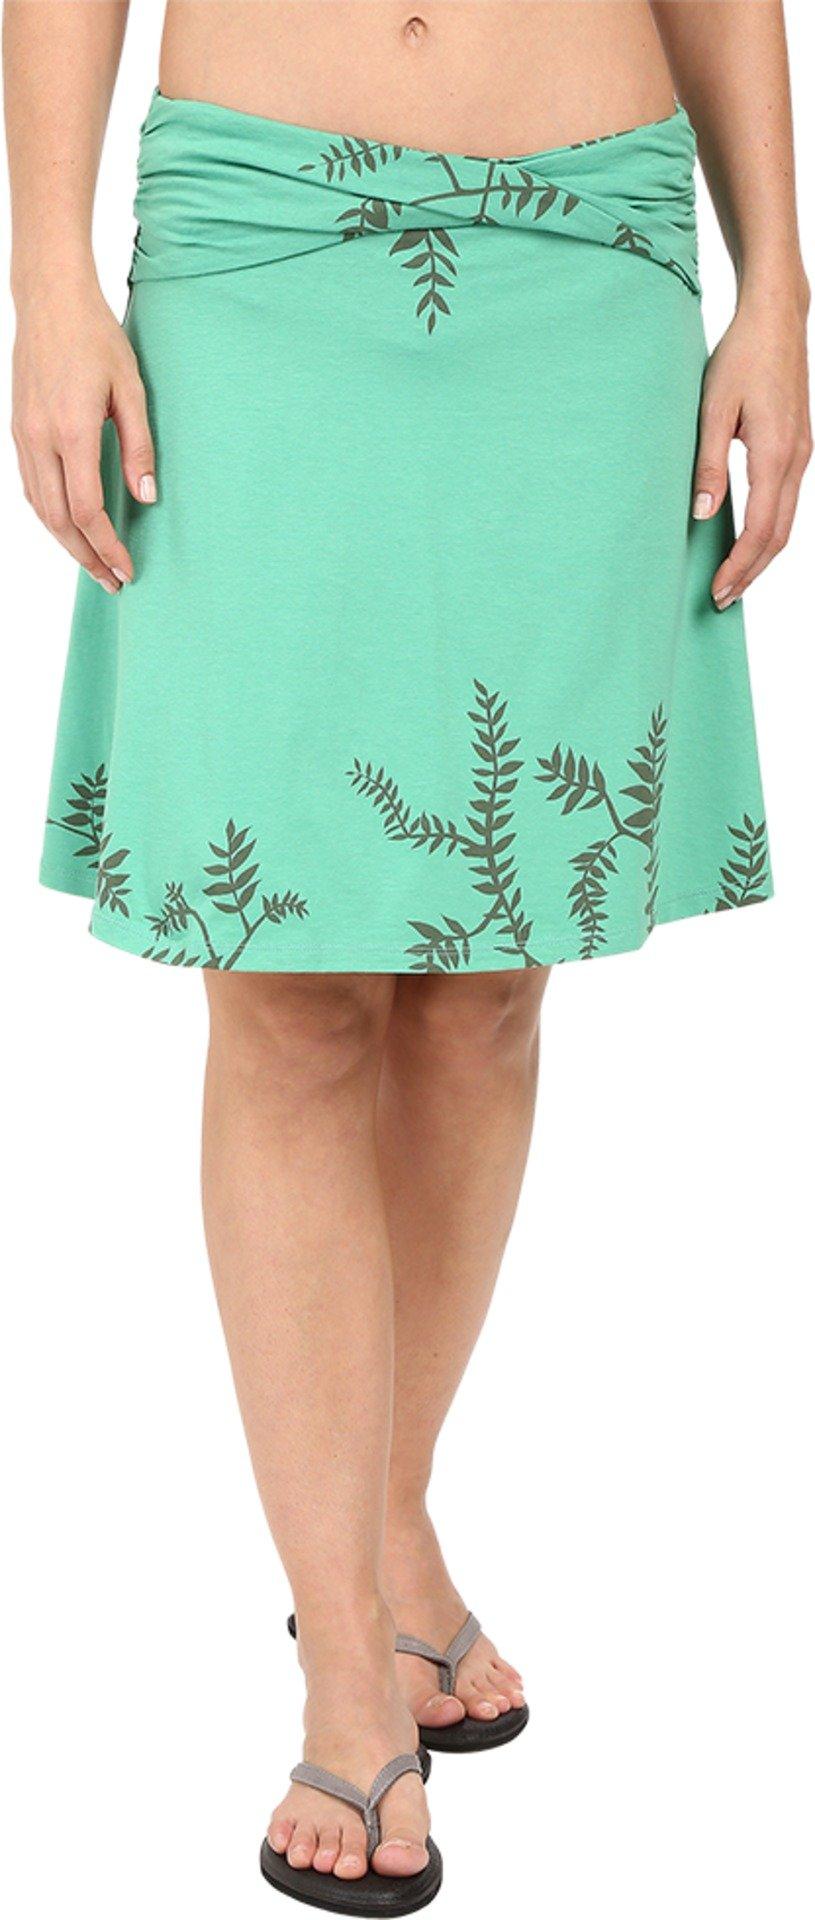 Toad&Co Women's Twila Skirt Green Awning Foliage Print Skirt